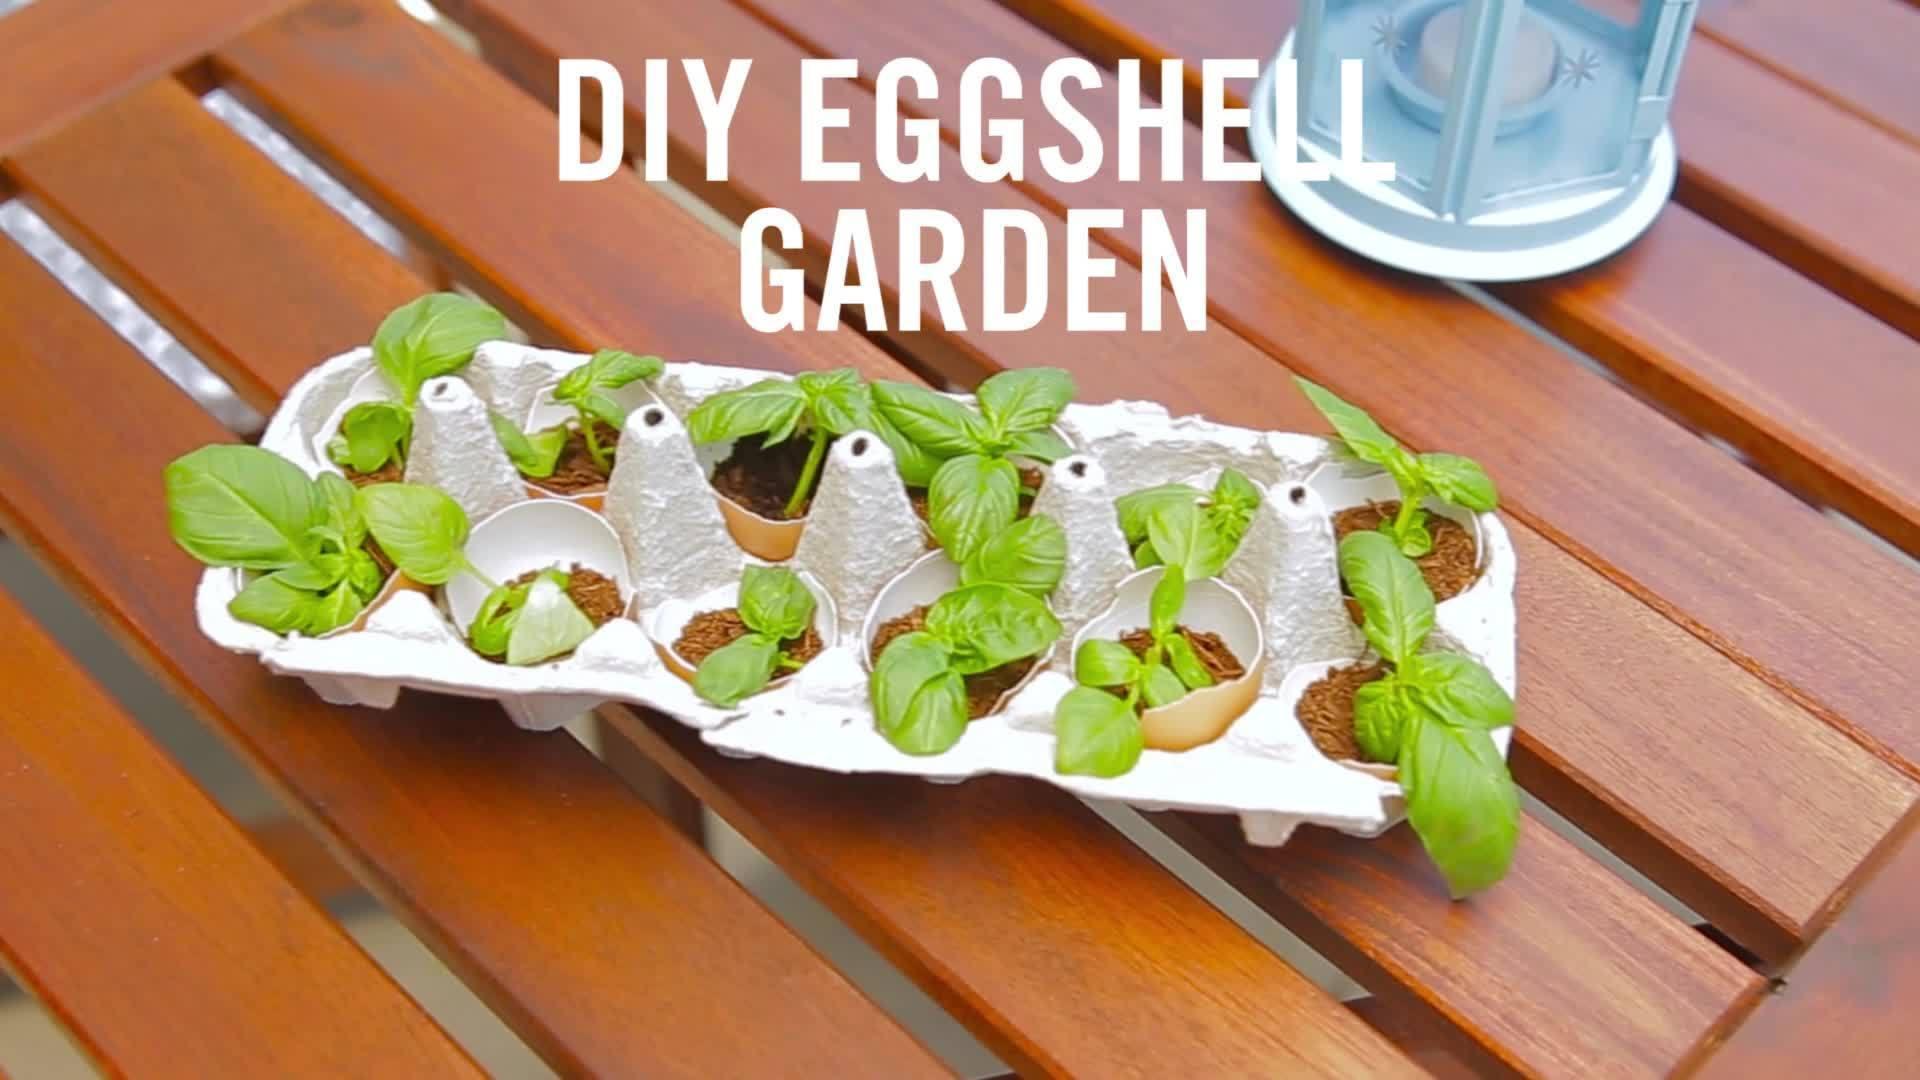 Disney DIY Eggshell Garden